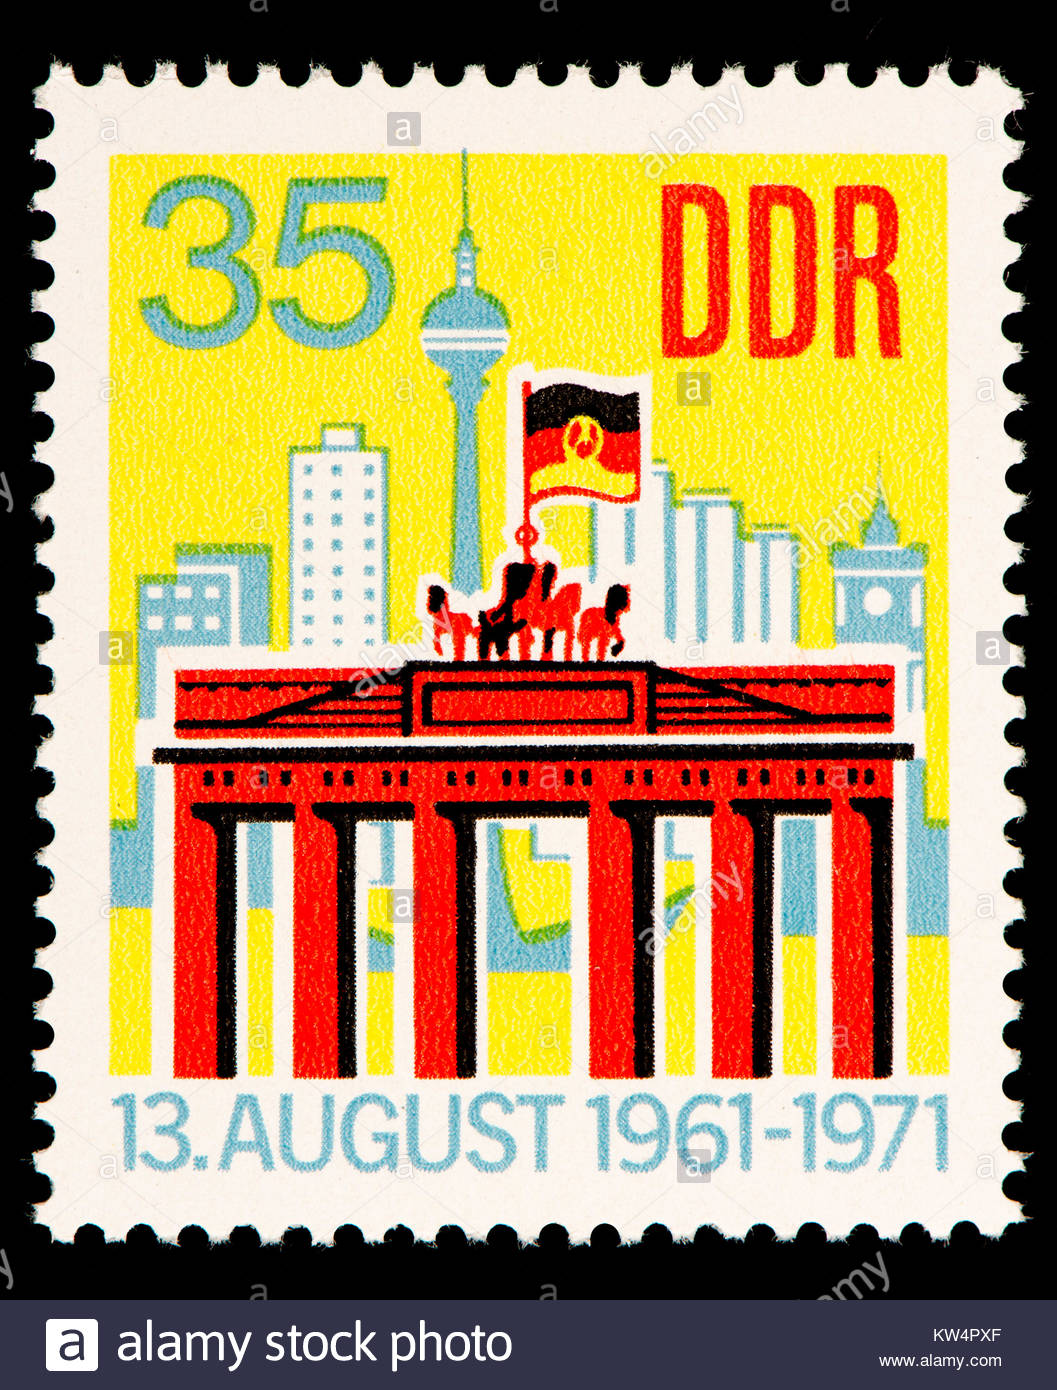 East German (DDR) postage stamp (1971): Ten years of the Berlin Wall.